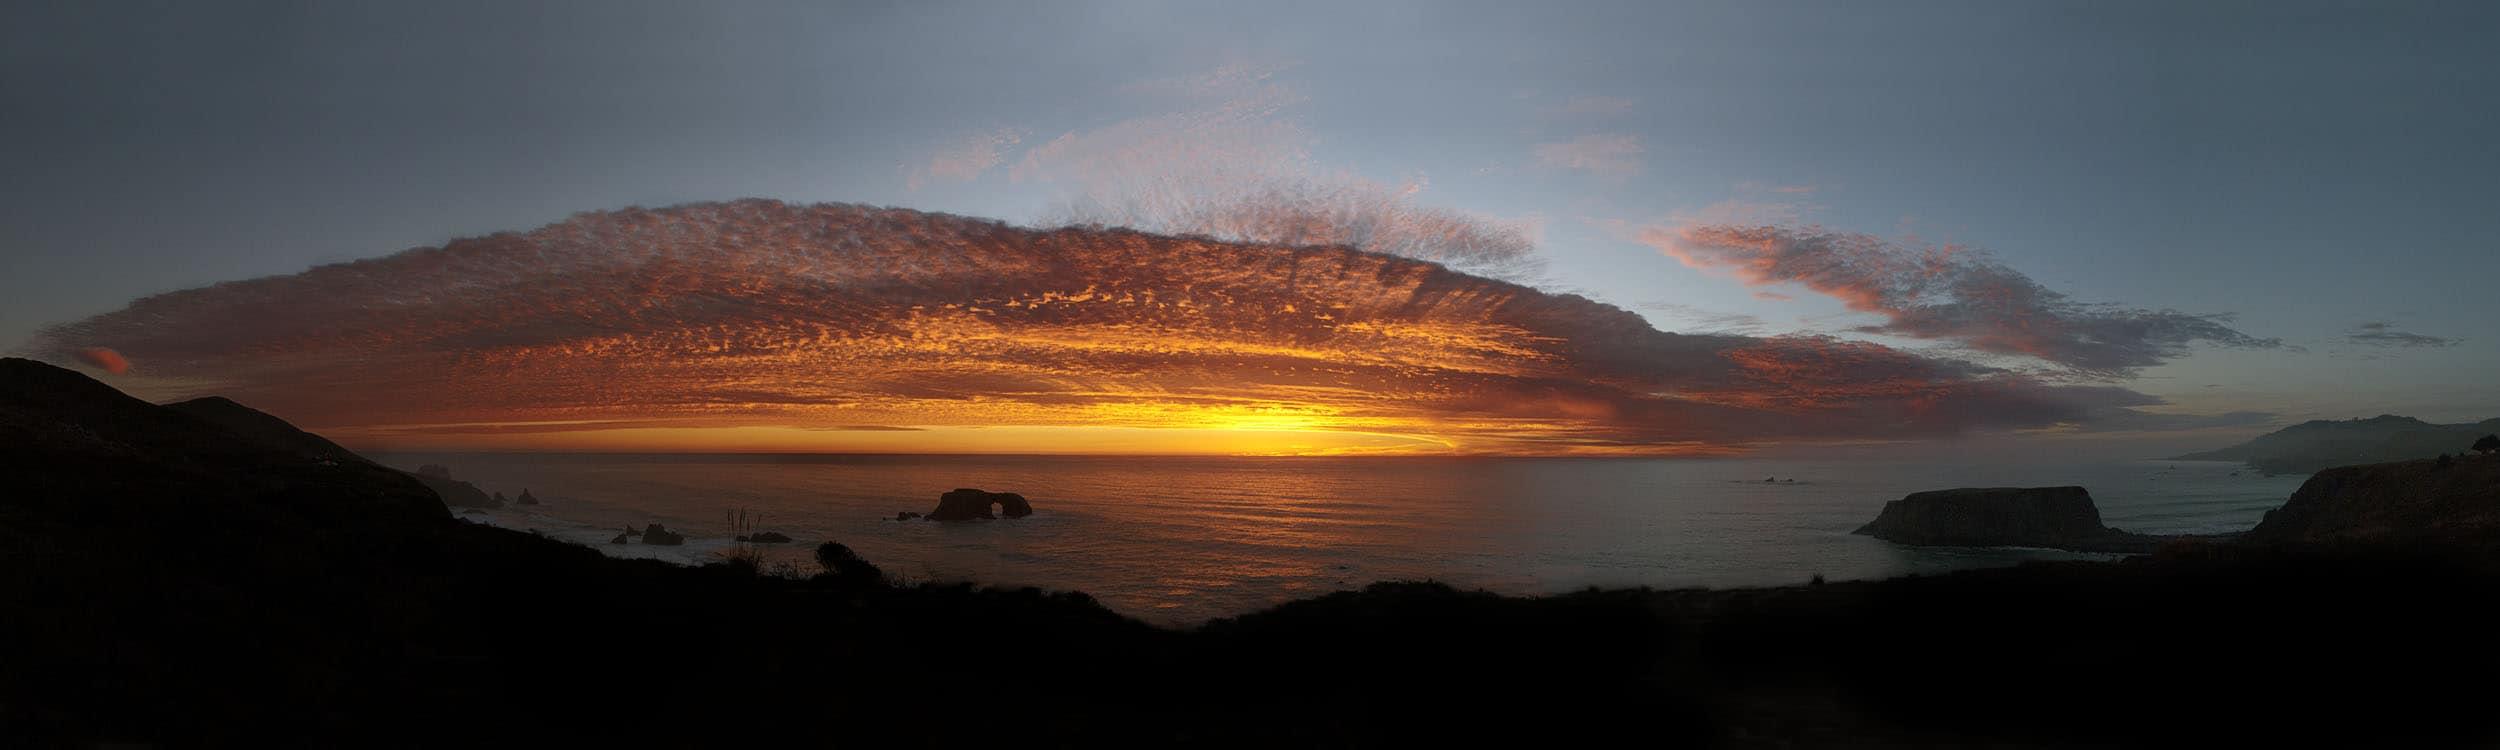 small Goat Beach Sunset, CA